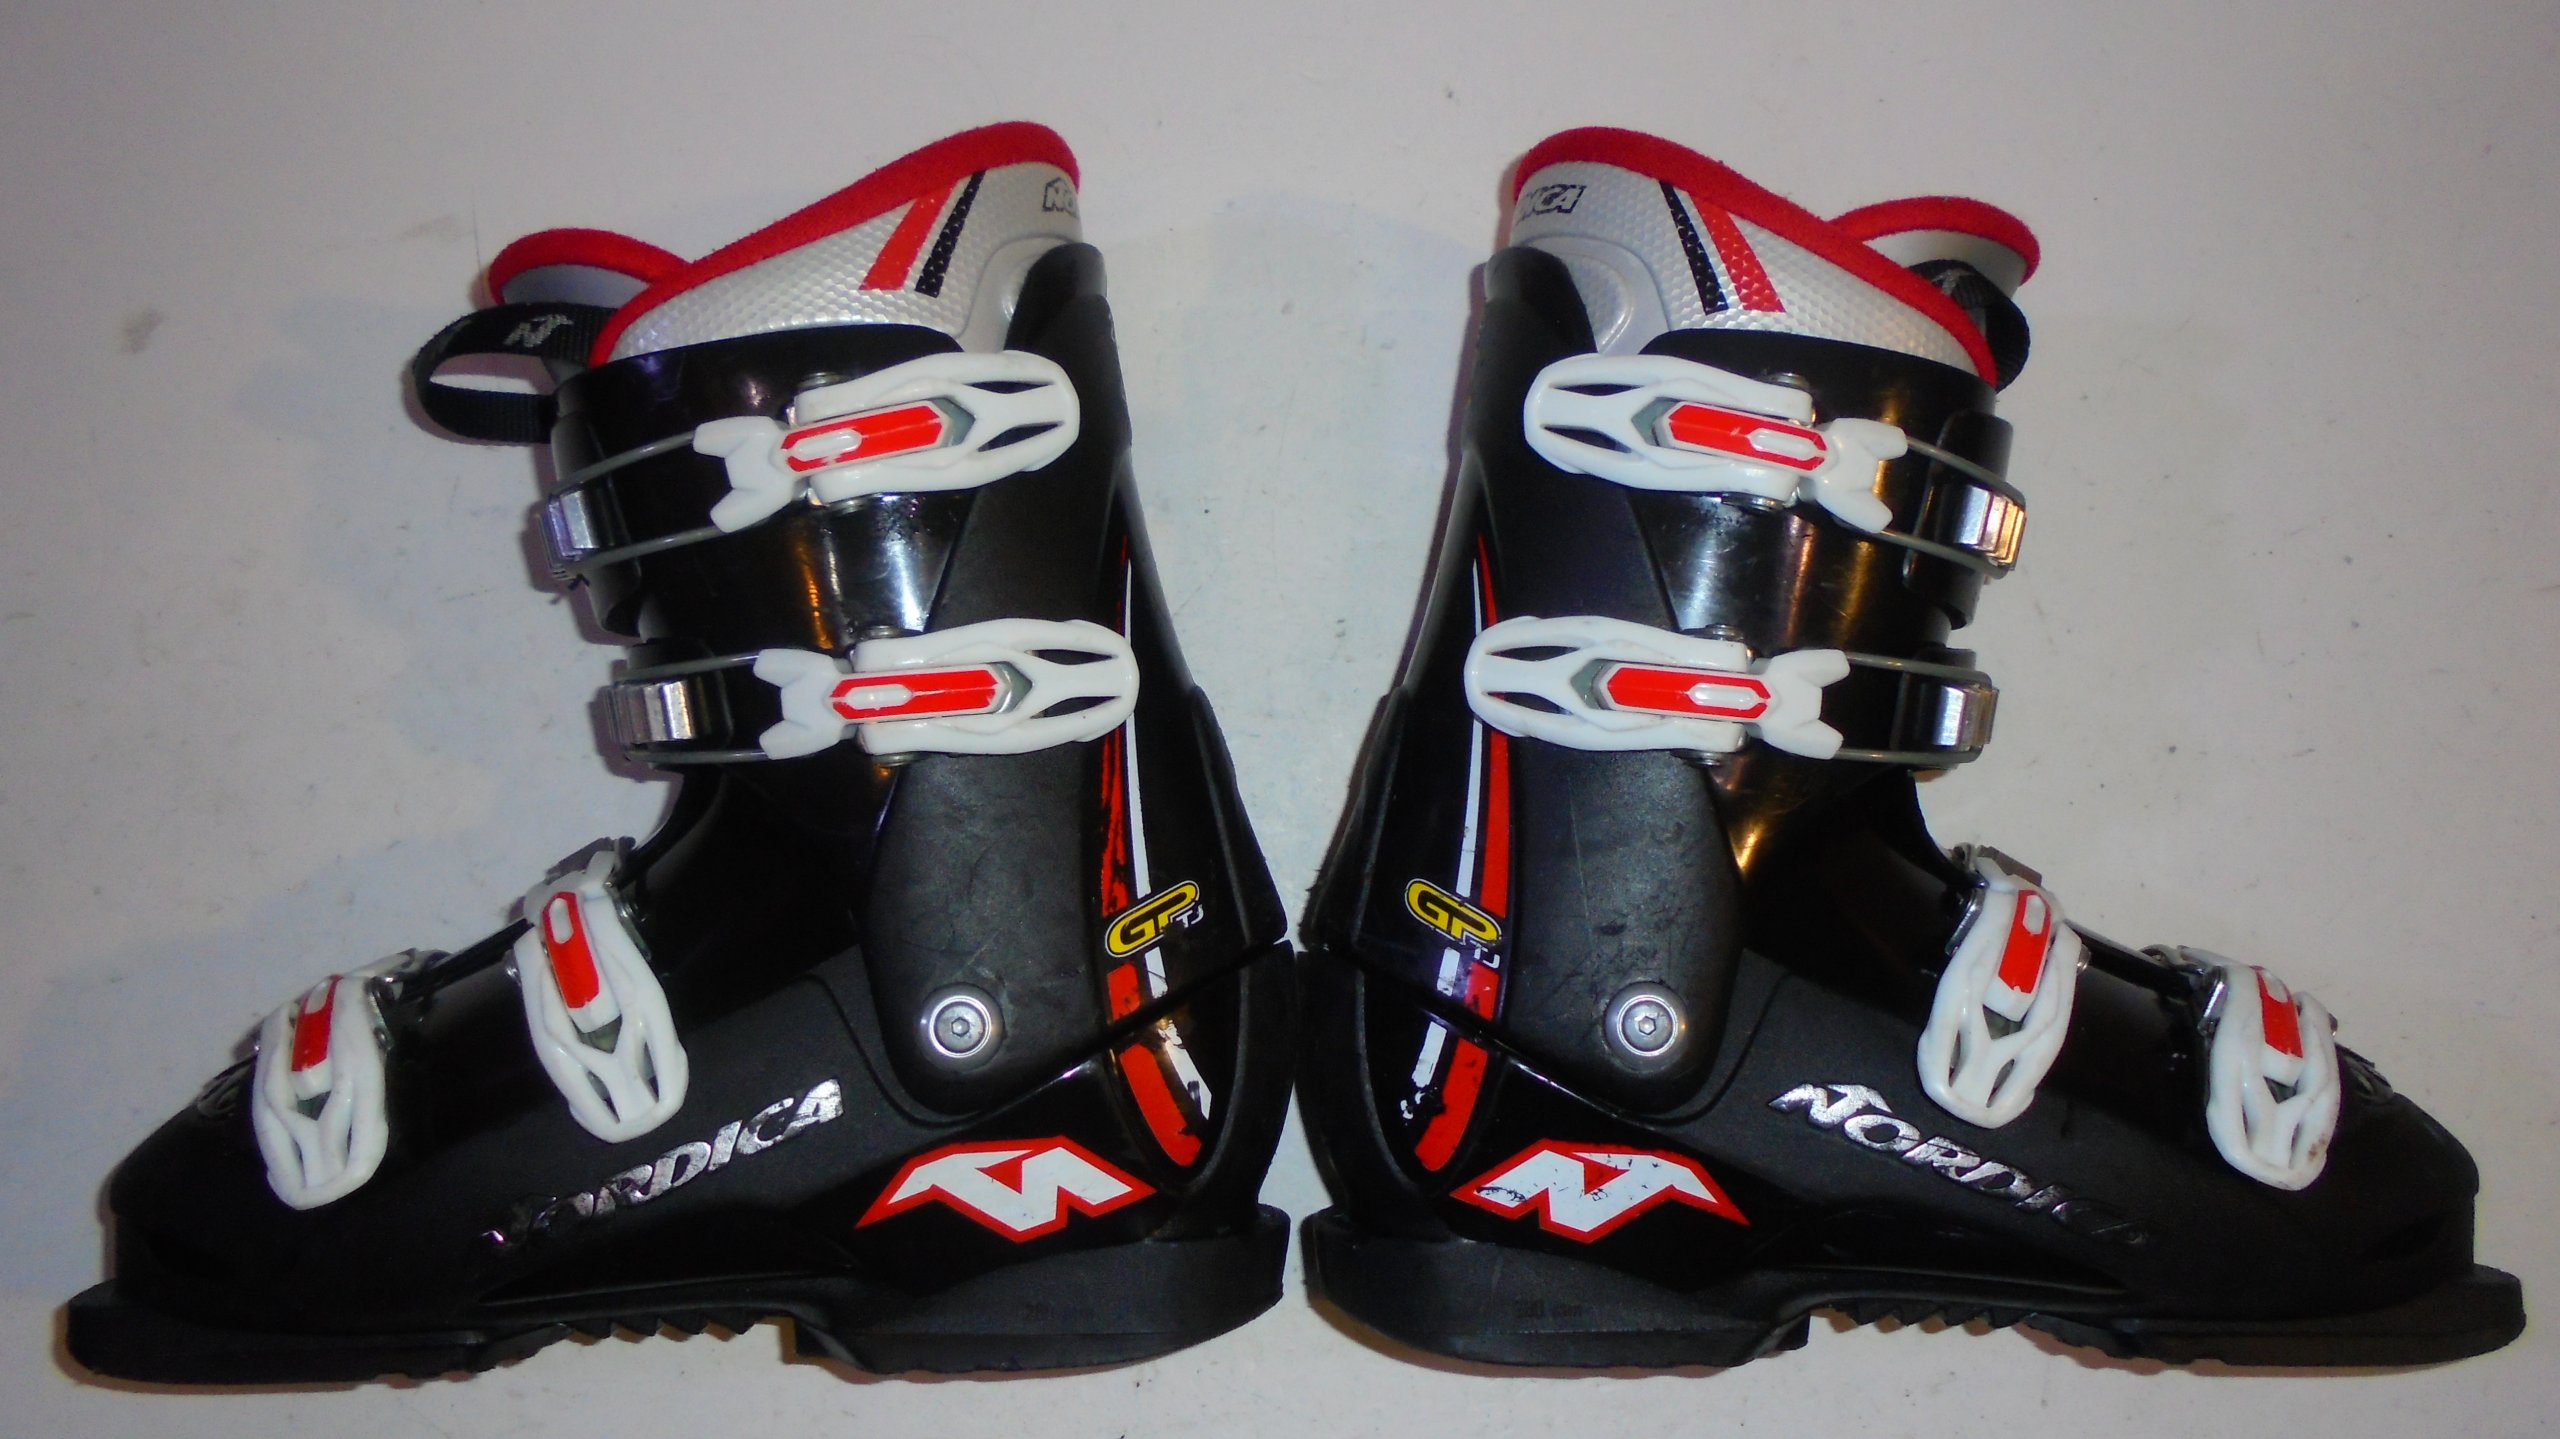 Buty narciarskie NORDICA GP TJ 24,5 (38,5)